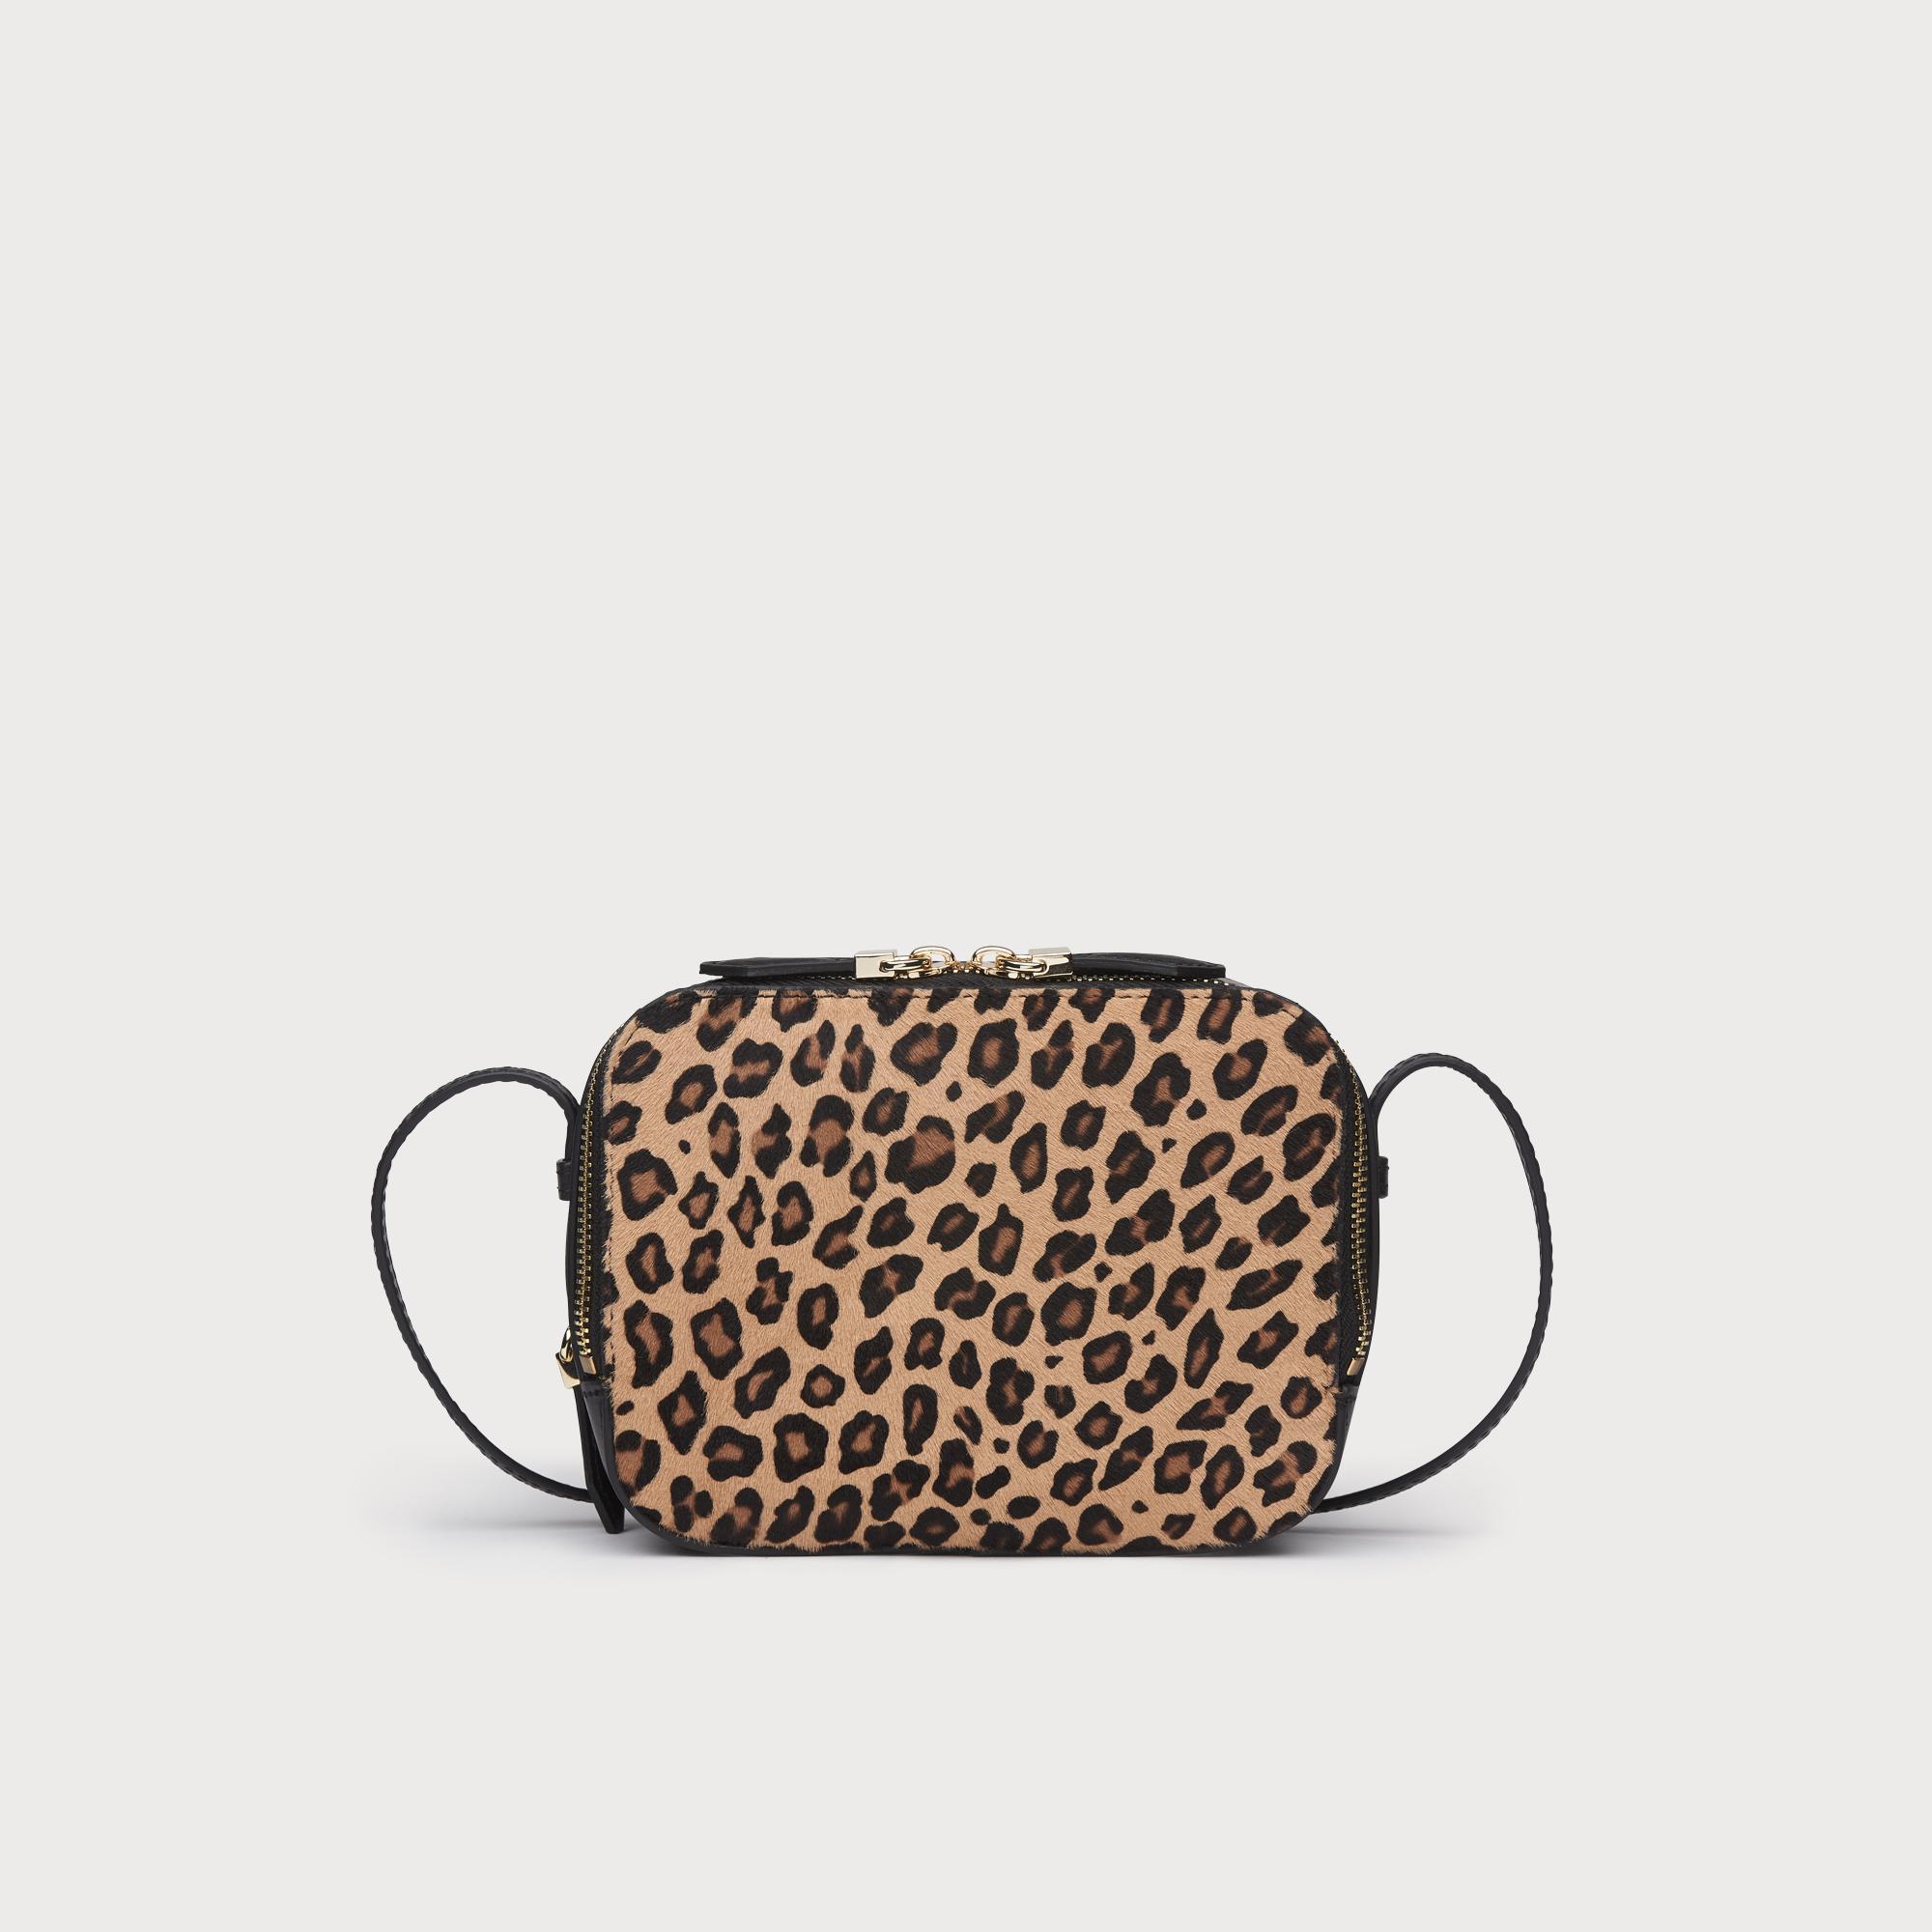 d3dd5a879c58 Mariel Leopard Print Calf Hair Shoulder | Handbags | L.K.Bennett